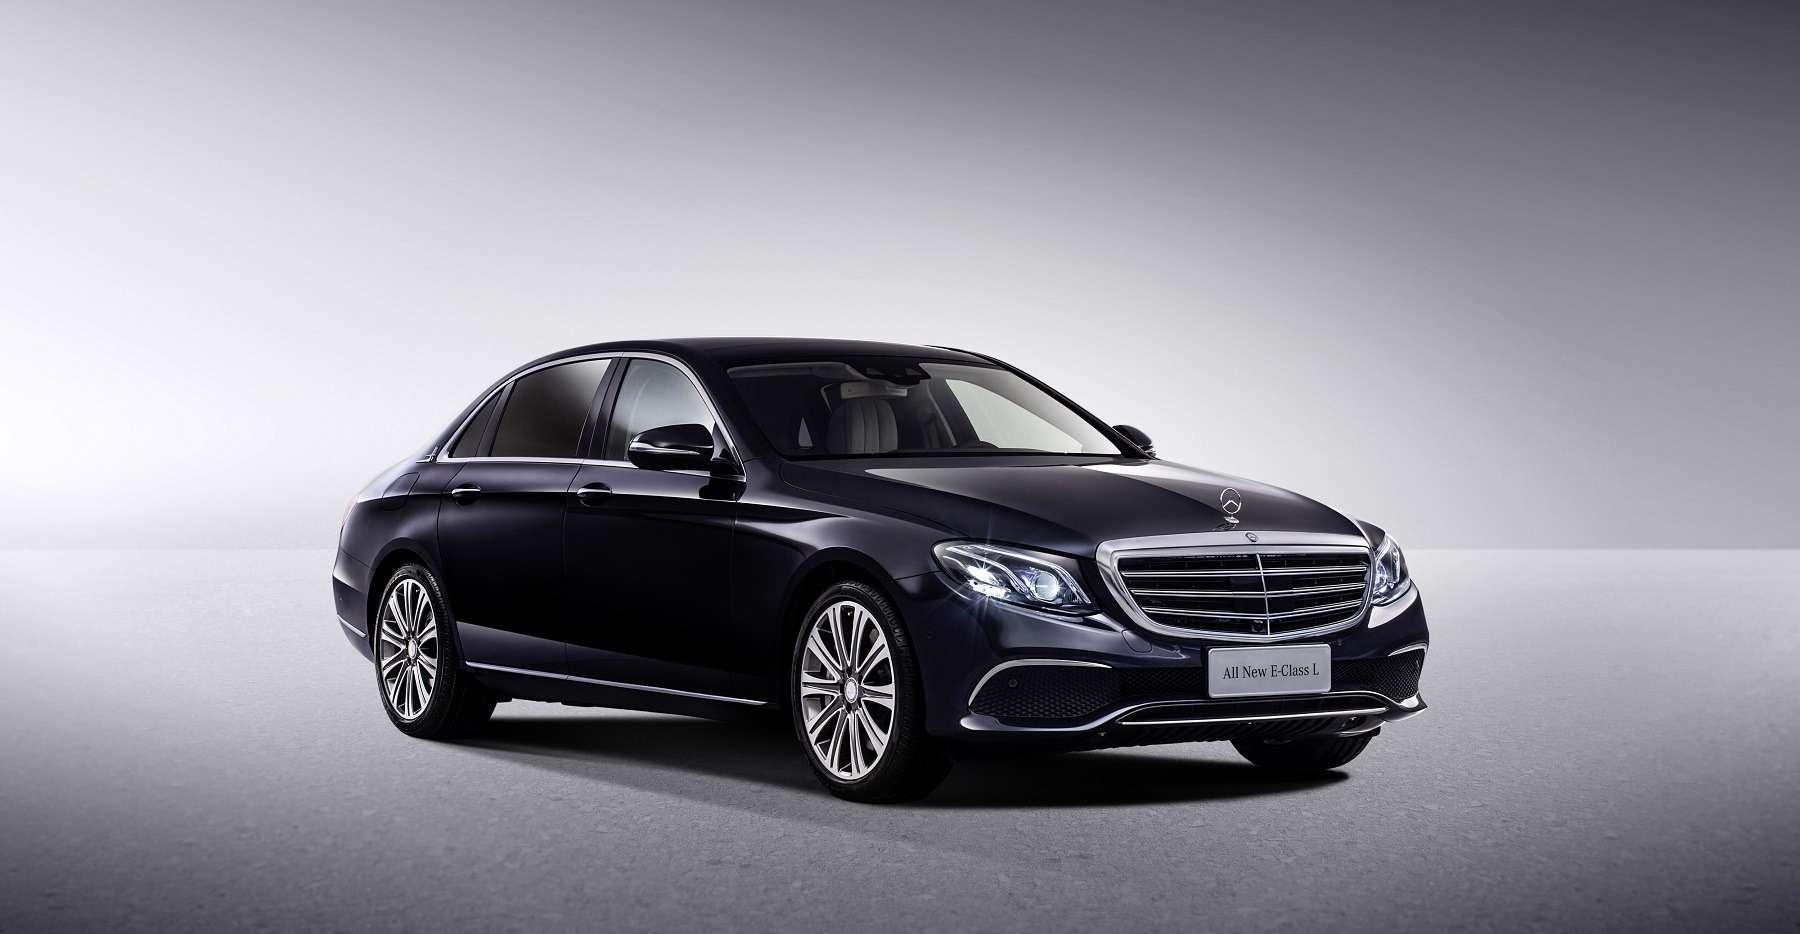 Дело остиле исантиметрах: Mercedes-Benz E-класса растянулся совкусом— фото 580056